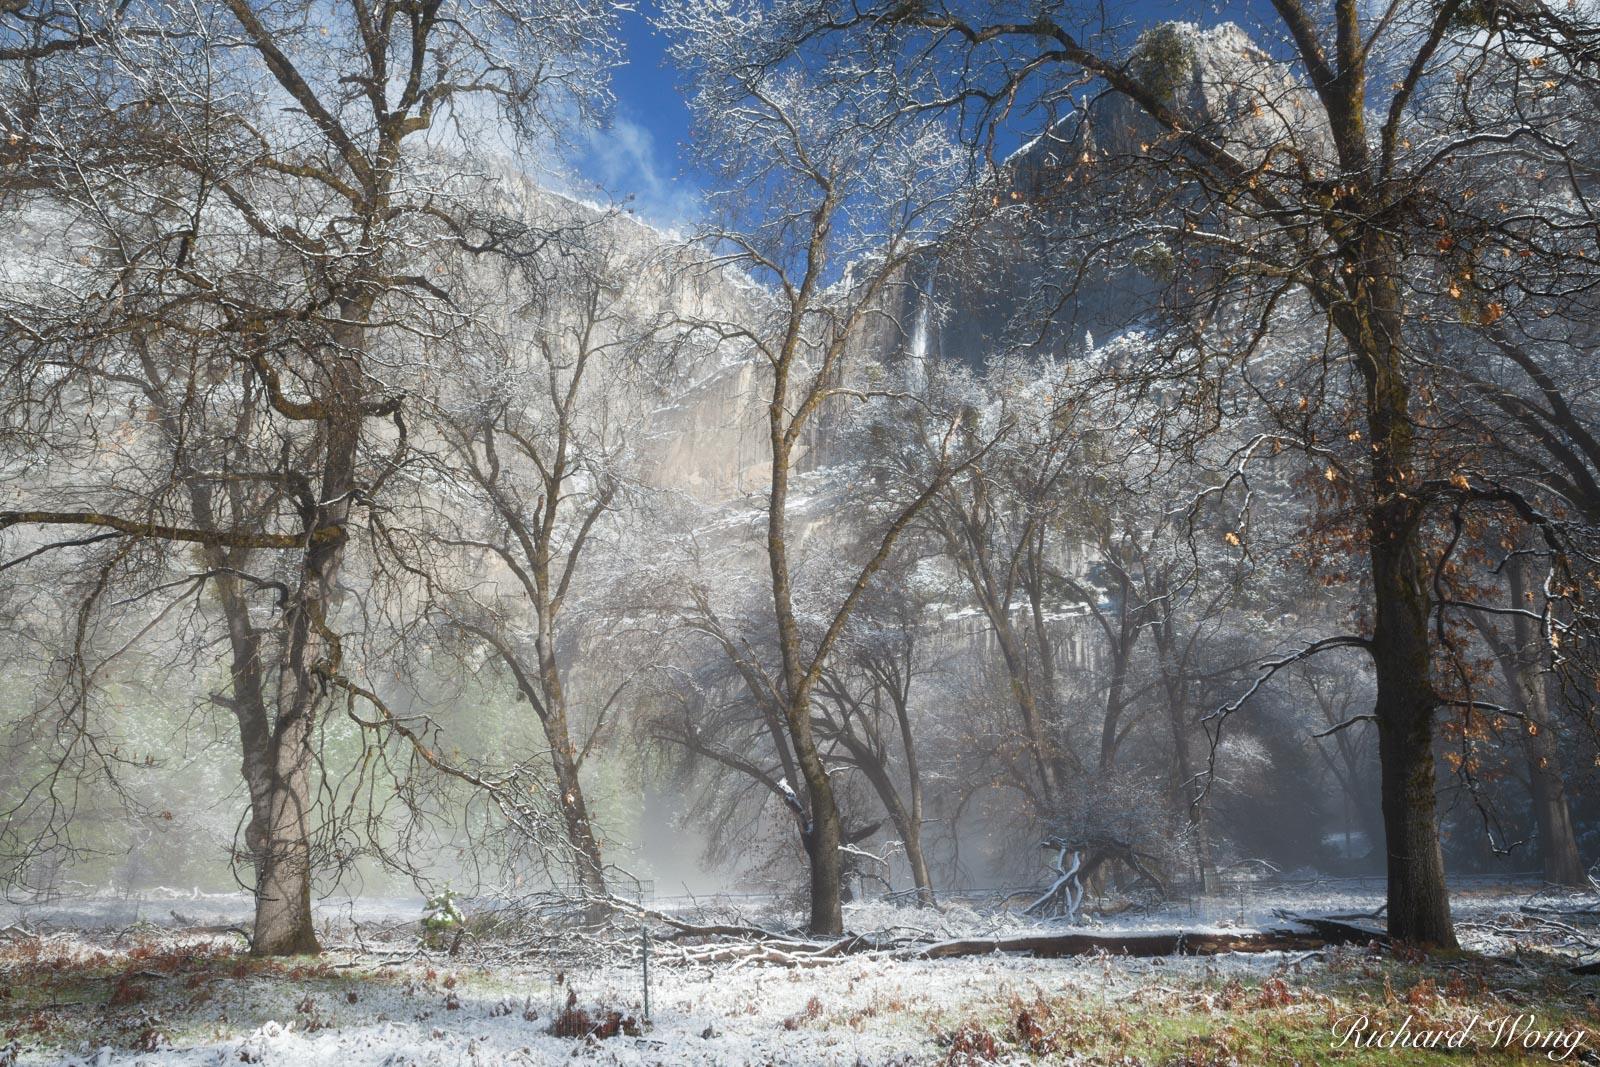 Yosemite Falls After Spring Snowstorm, Yosemite National Park, California, photo, photo